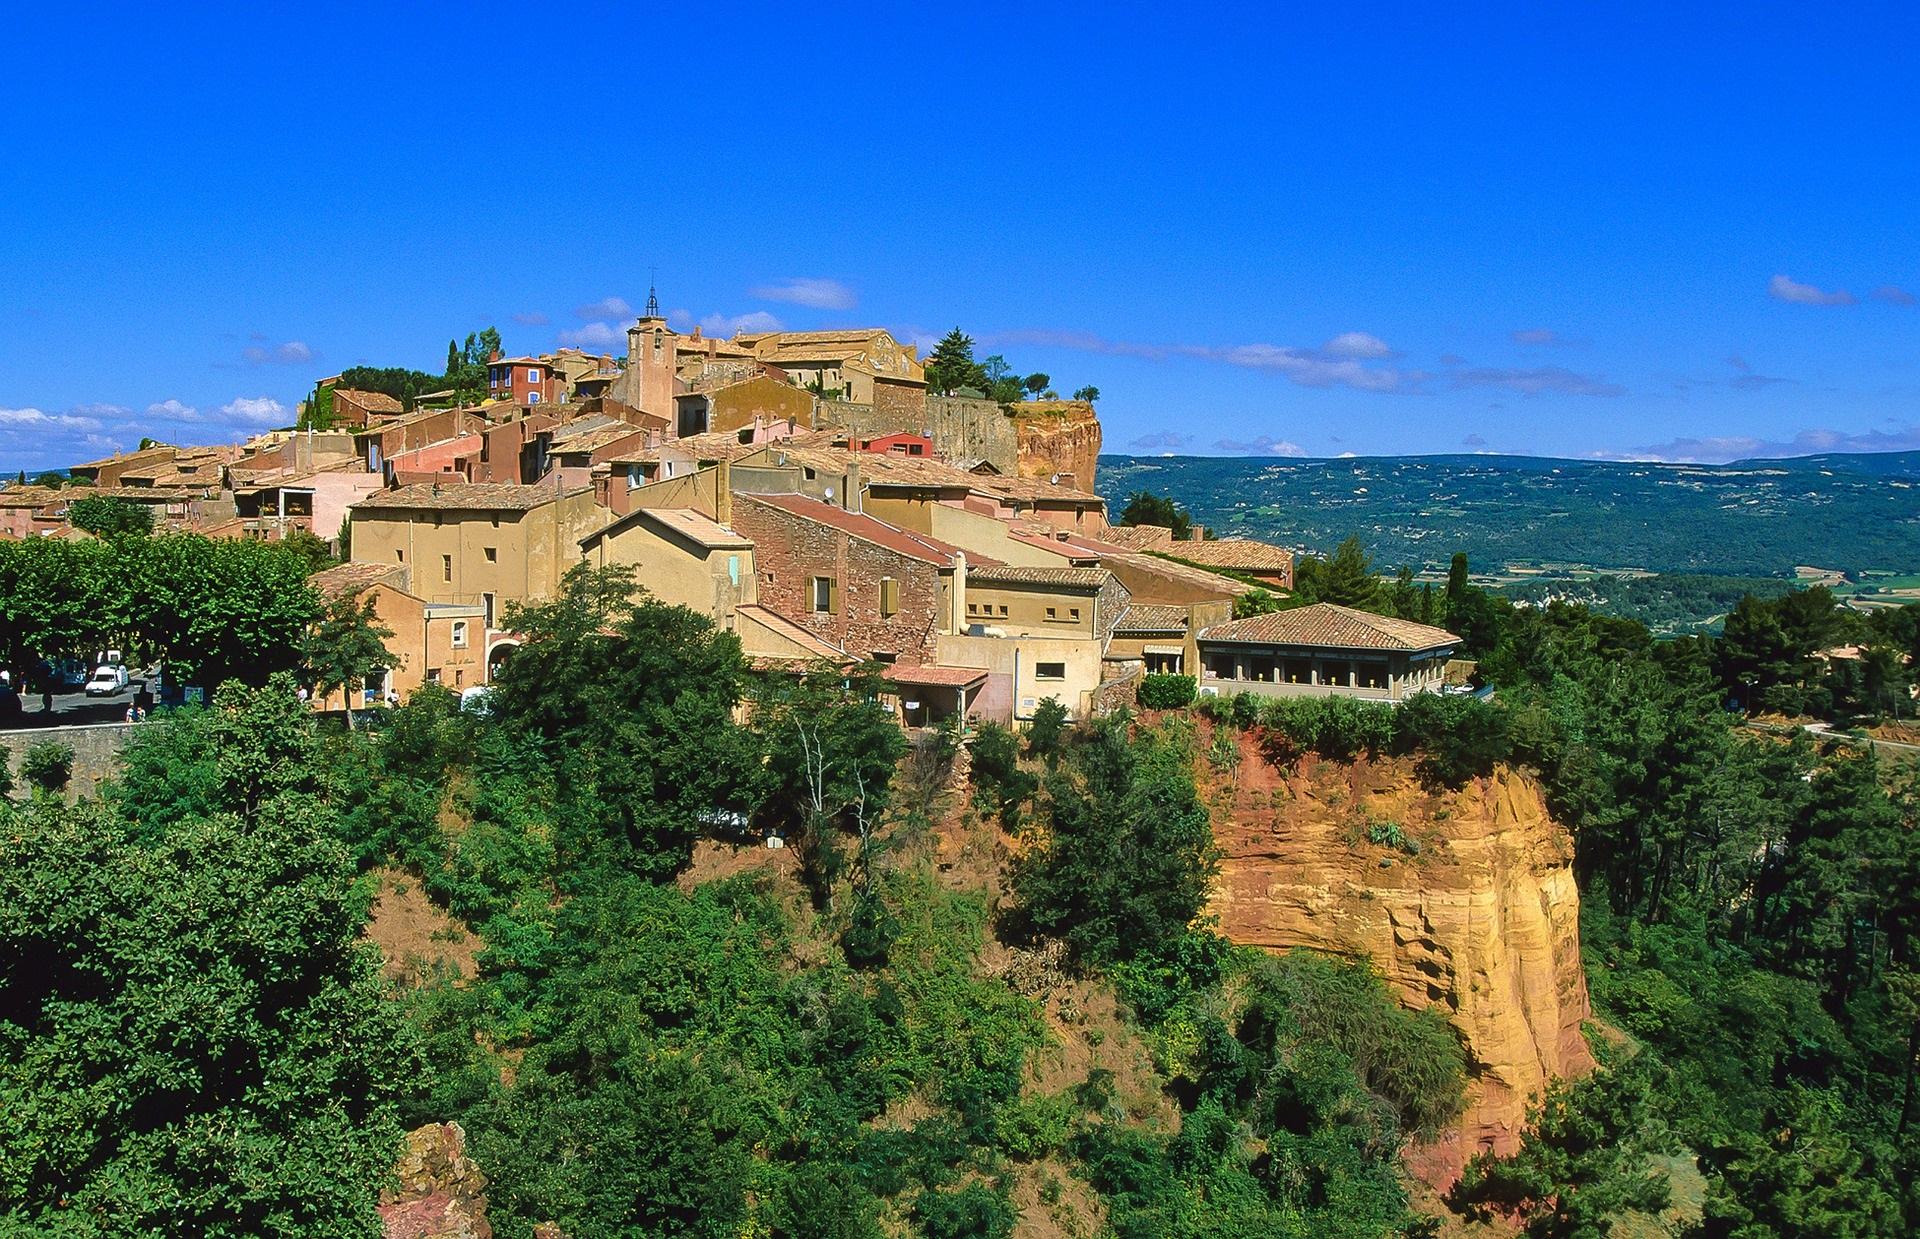 France-uzes-gard-luberon-wine-lavender-tasting-private tour